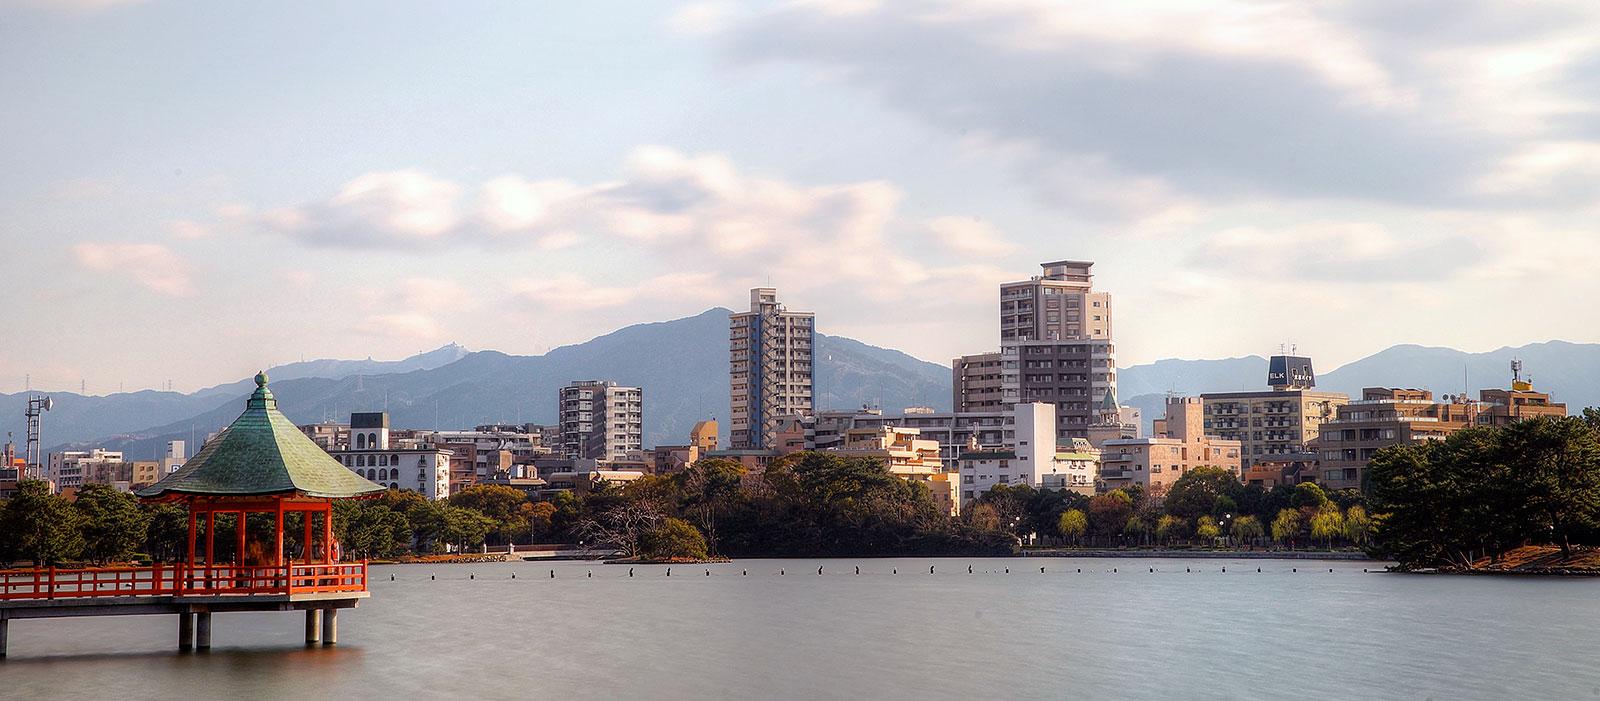 Friendly Fukuoka: 4 Types of People That Will Love Fukuoka